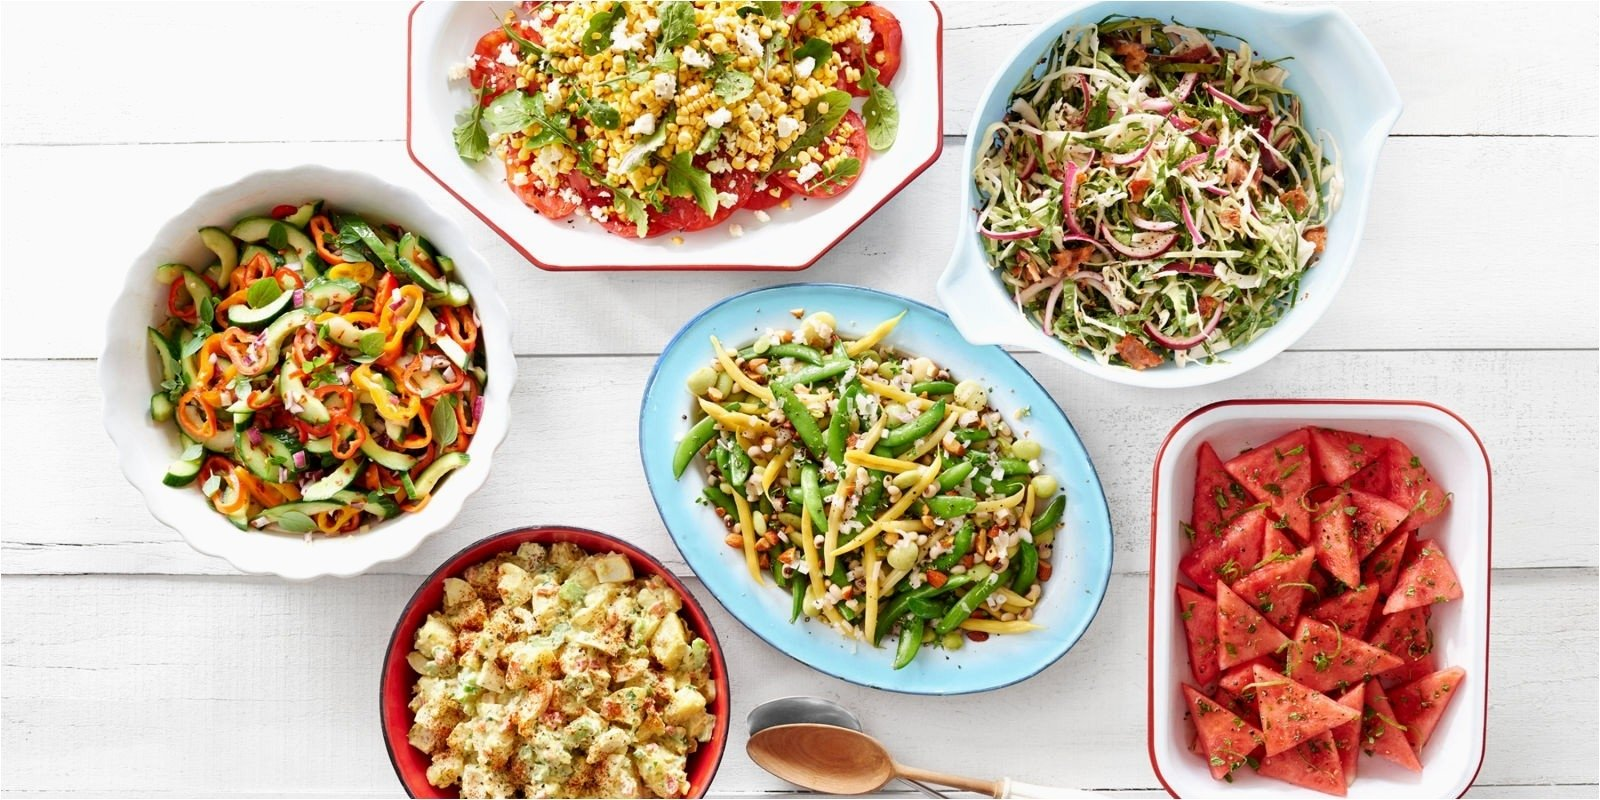 10 Lovable Christmas Dinner Ideas For Large Group 96 christmas food ideas for large groups food from the christmas 1 2021